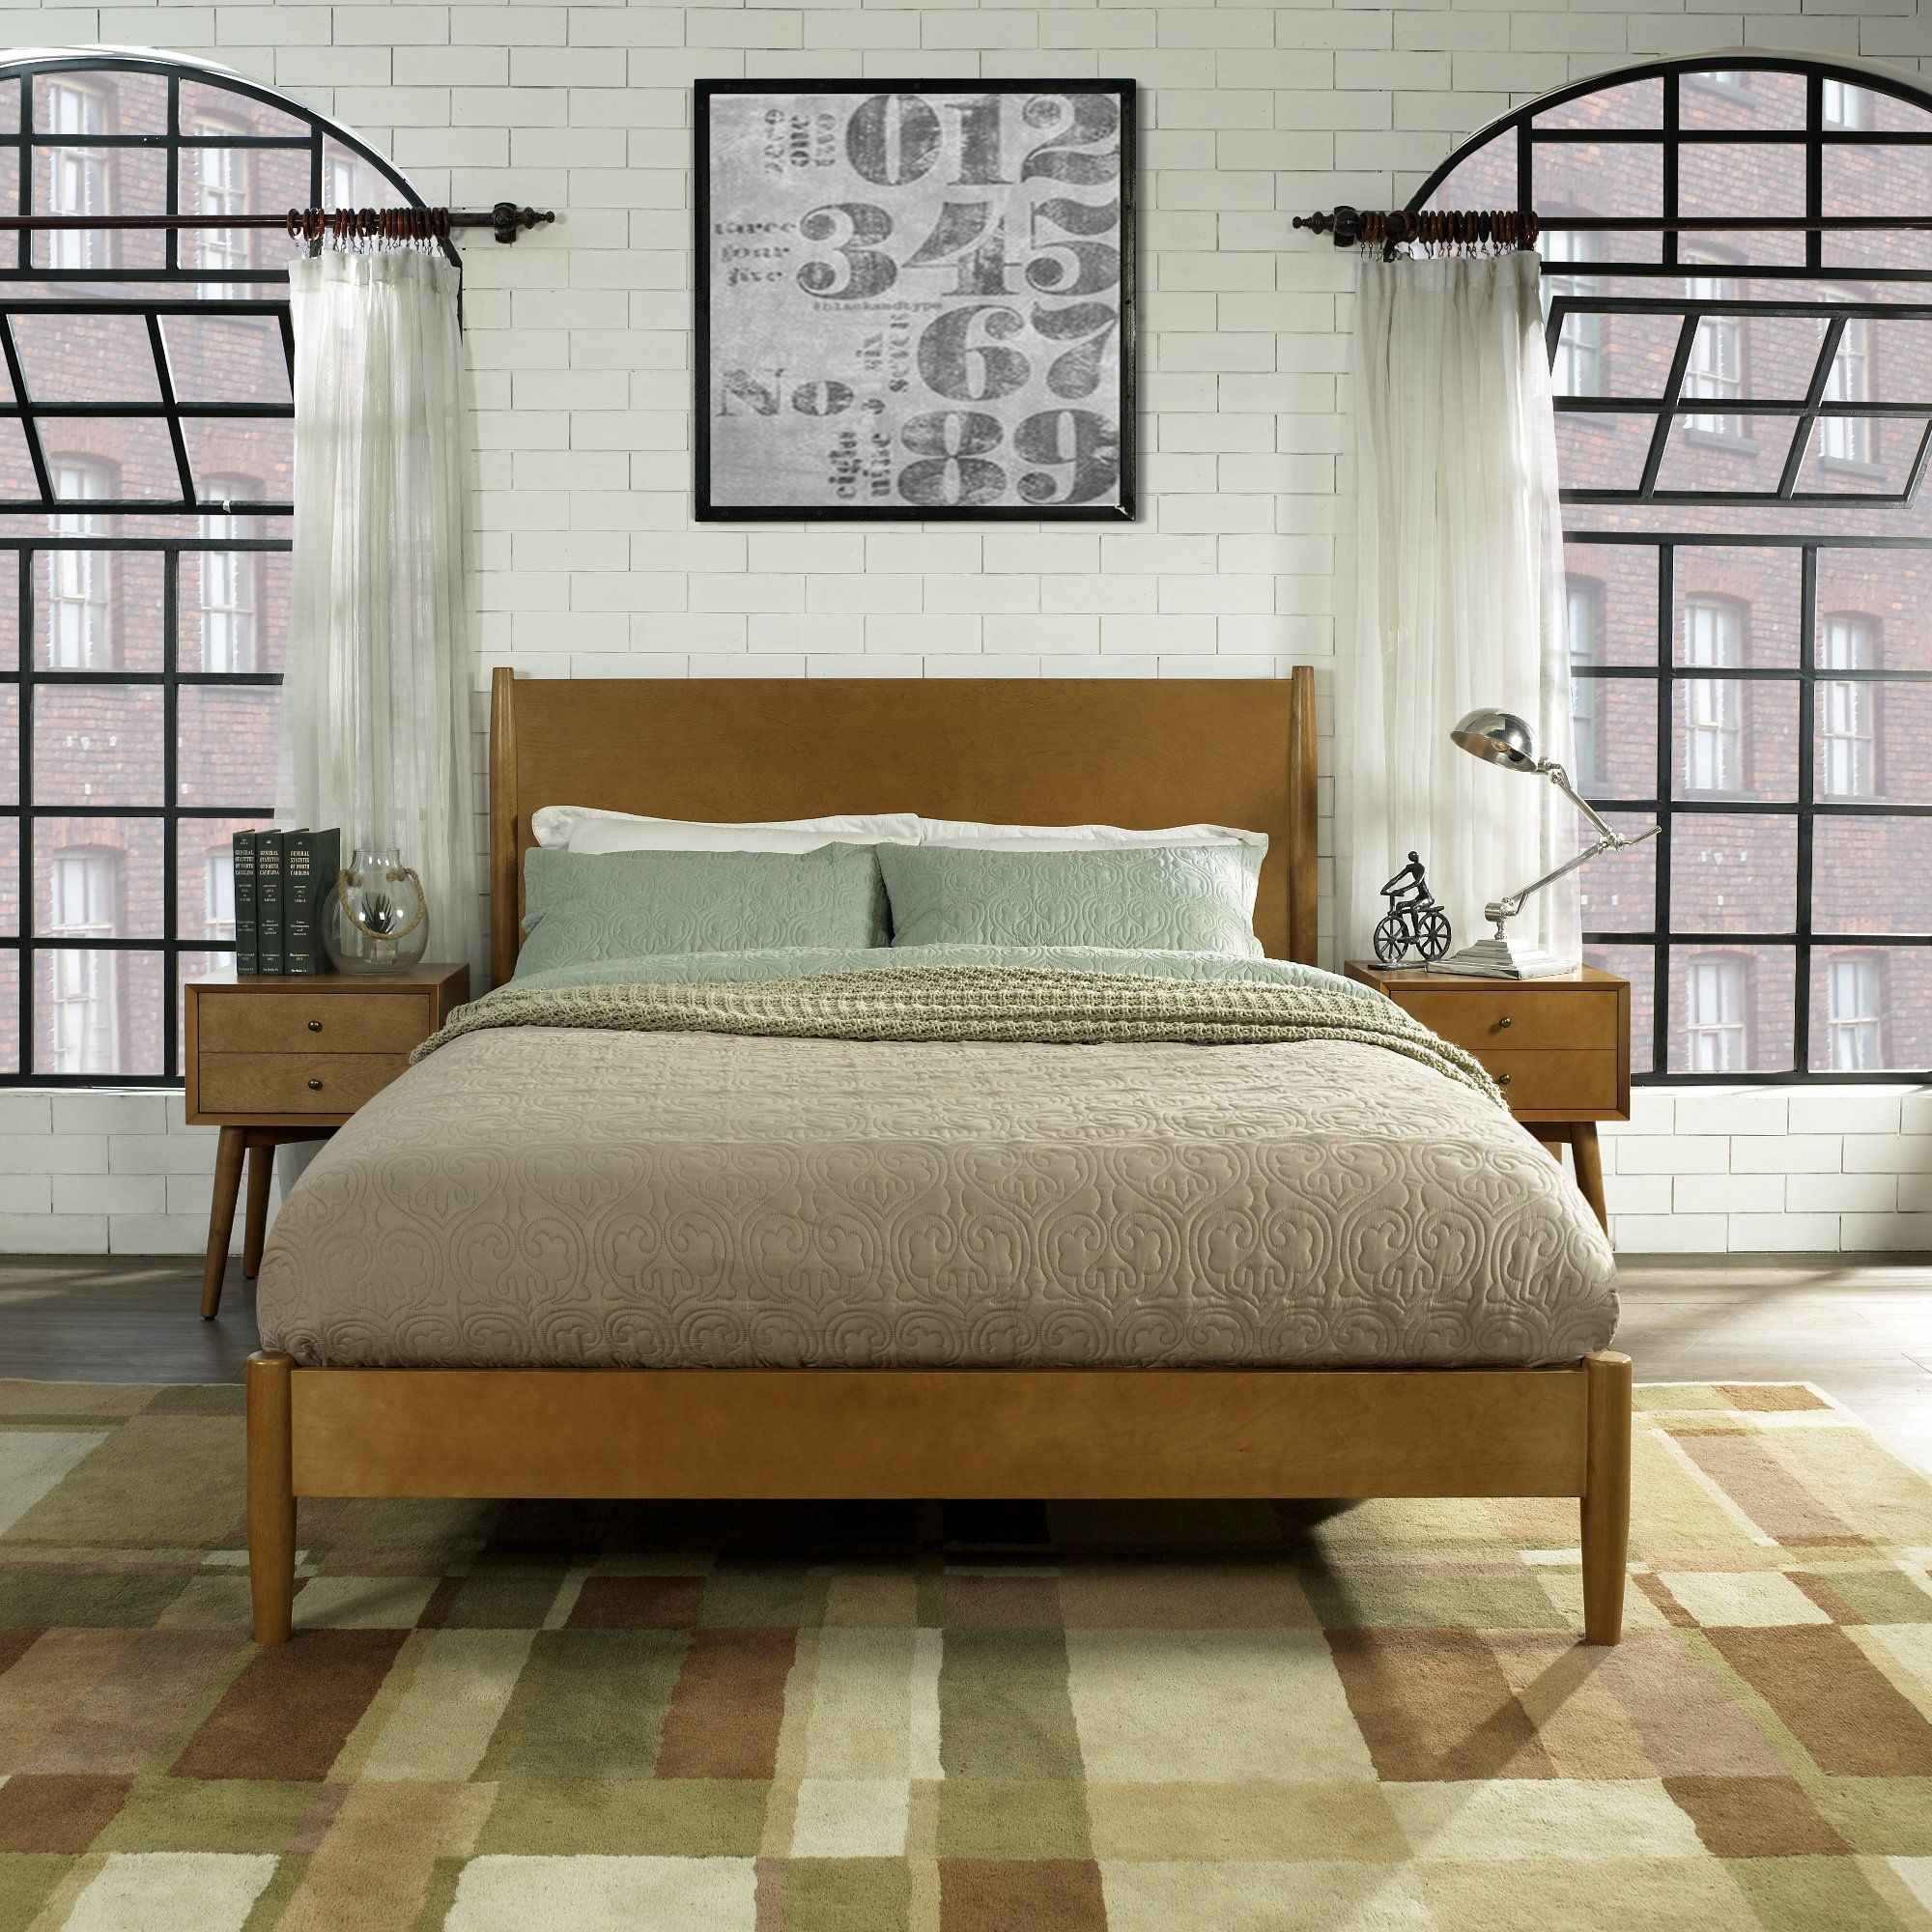 Best Mid Century Modern Acorn Brown King Platform Bed Landon King Platform Bed Mid Century 400 x 300